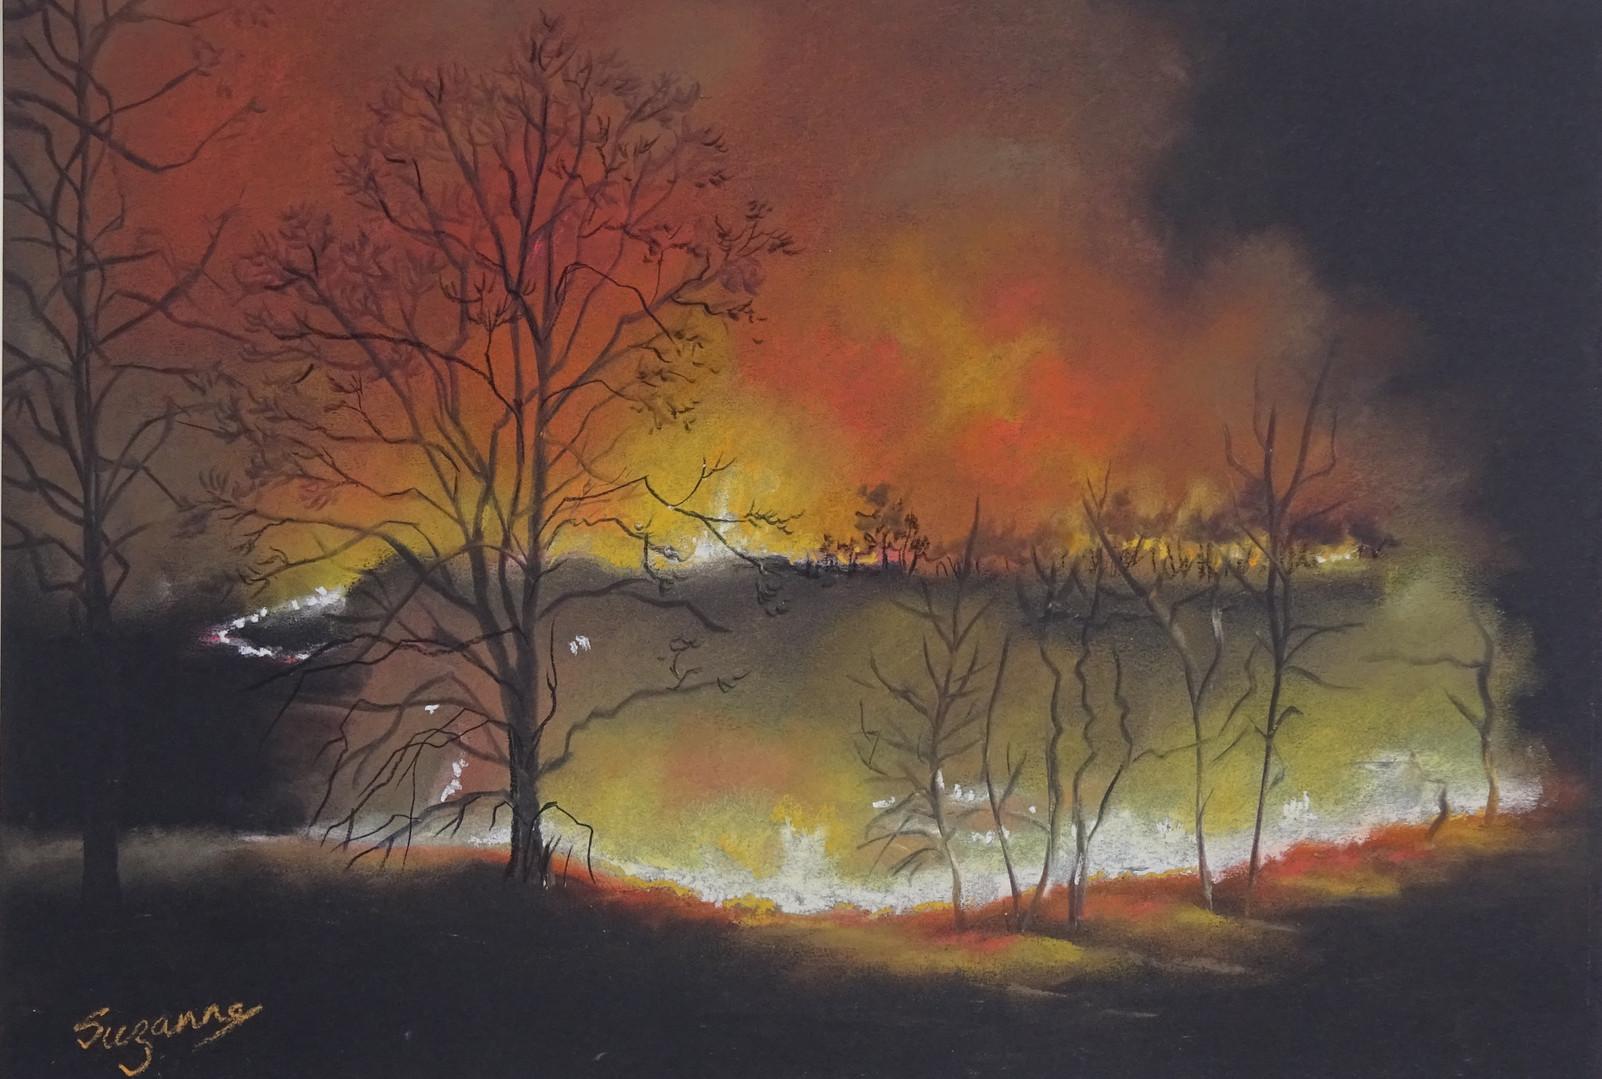 Wildfire Creeps at Night.